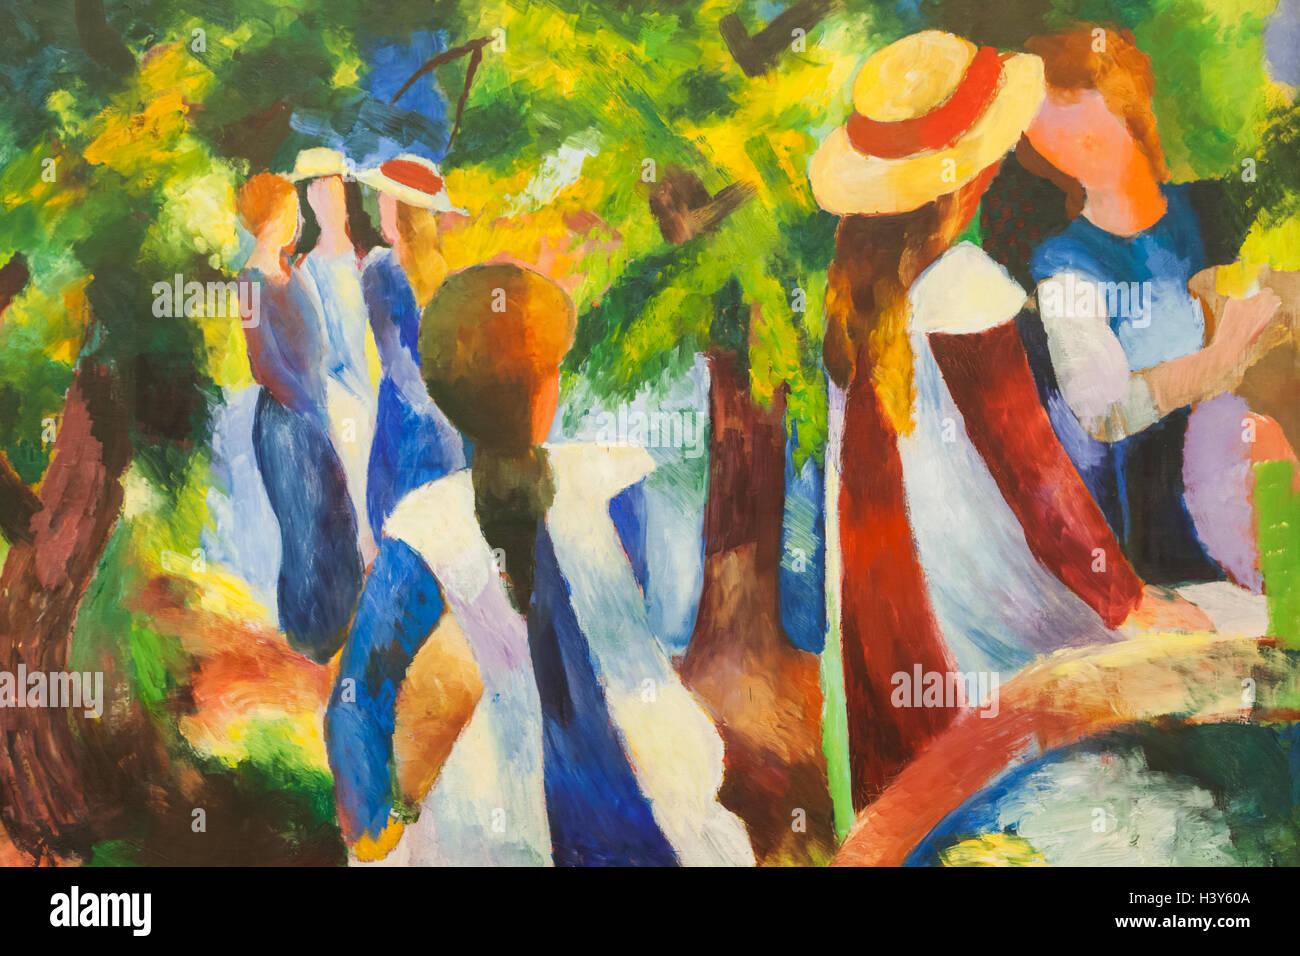 In Germania, in Baviera, Monaco di Baviera, la Pinakothek Museo di Arte Moderna (Pinakothek der Moderne), Pittura Immagini Stock